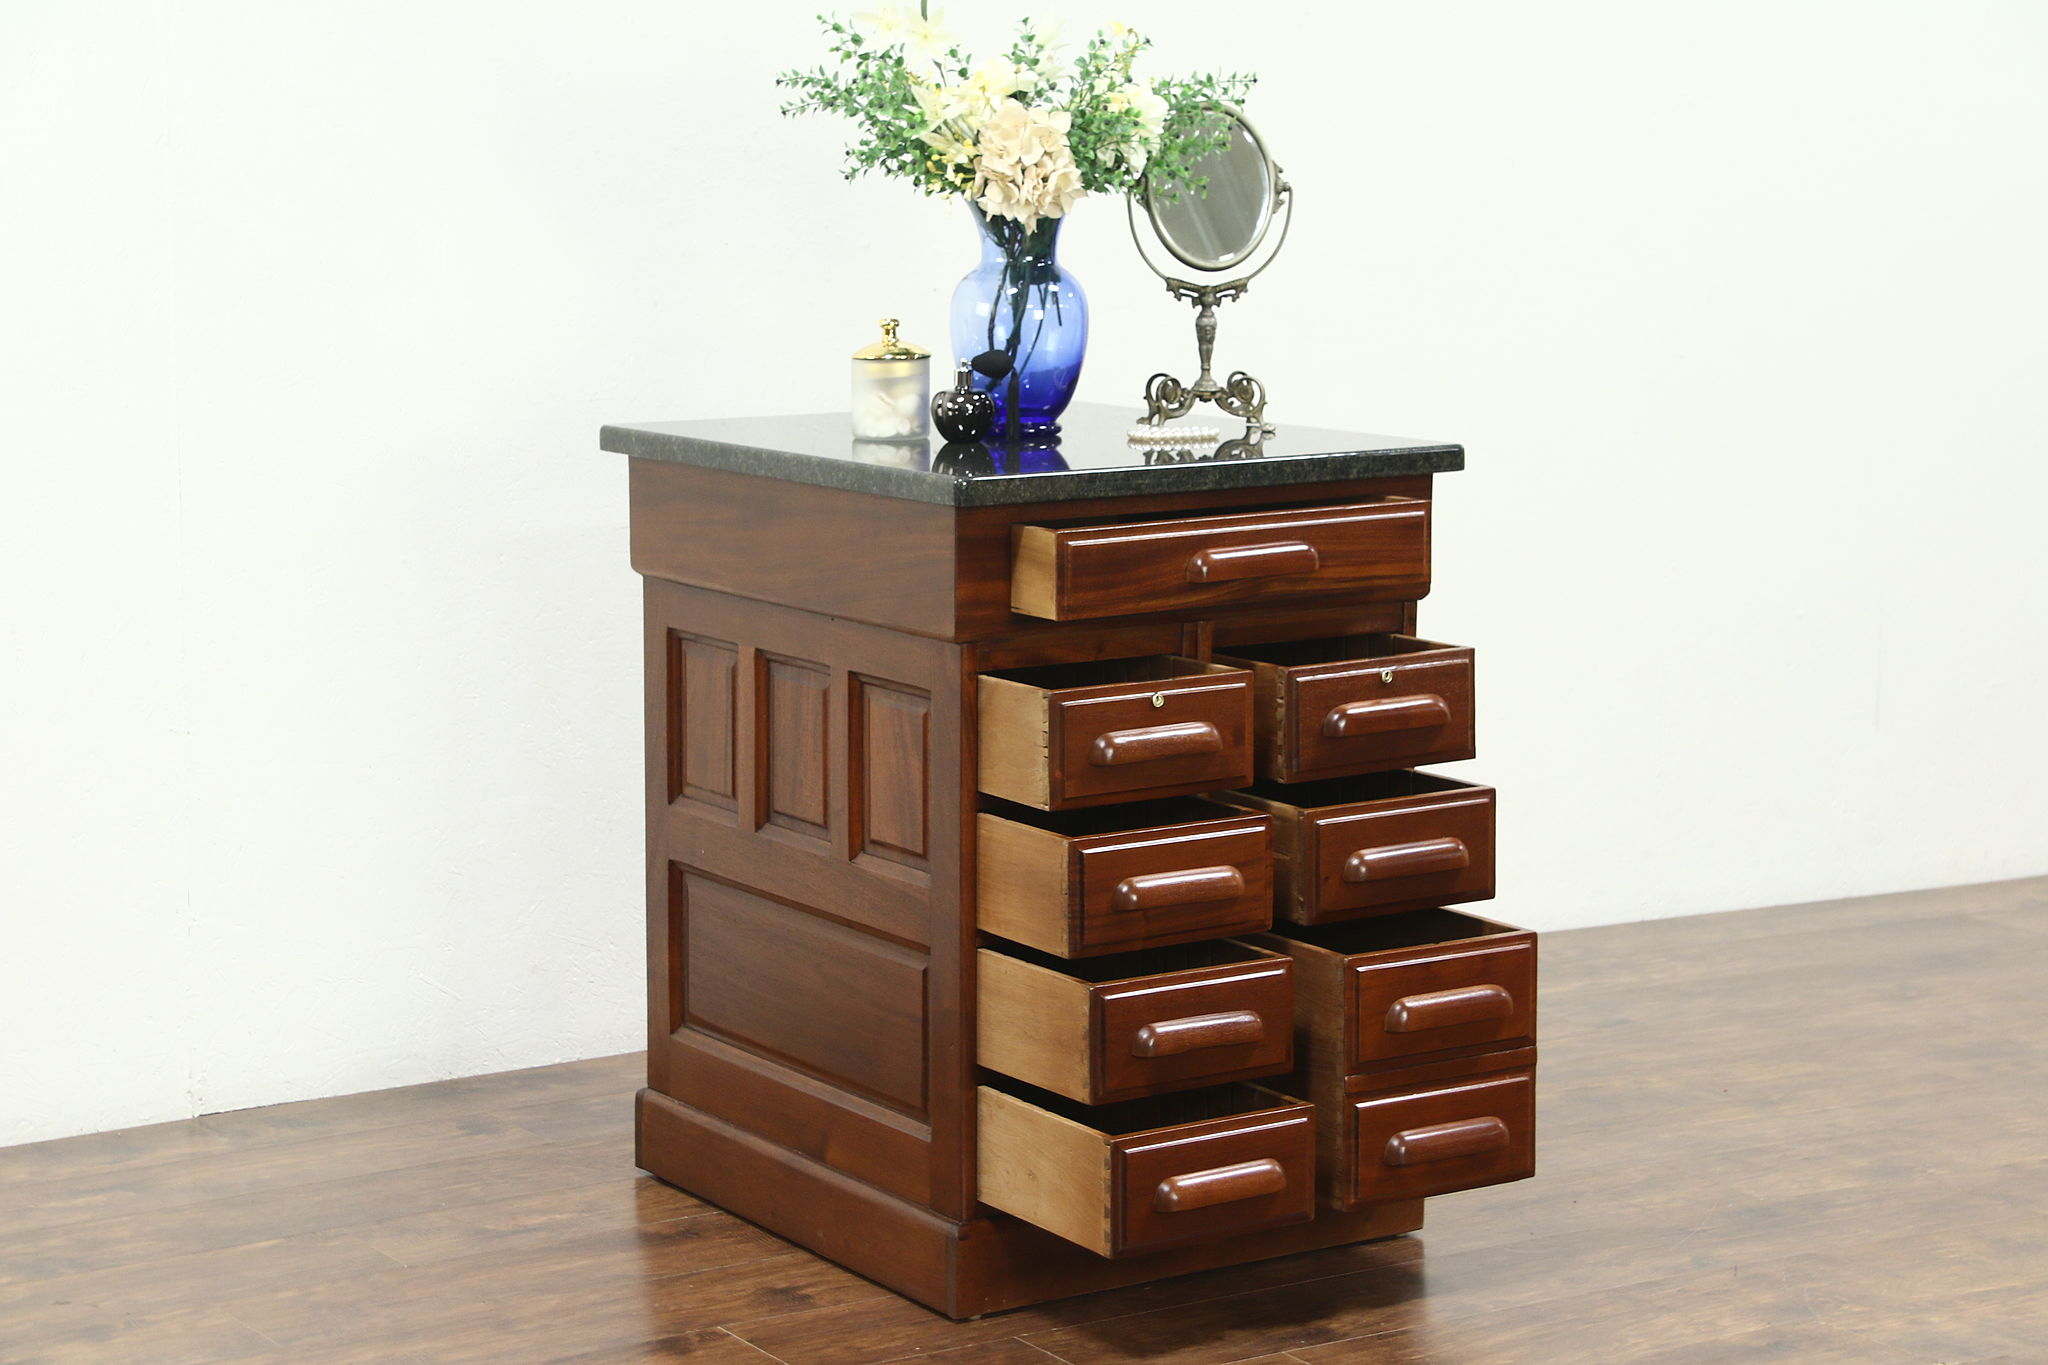 Mahogany Antique Kitchen Island Counter, Wine Tasting Table, Granite Top